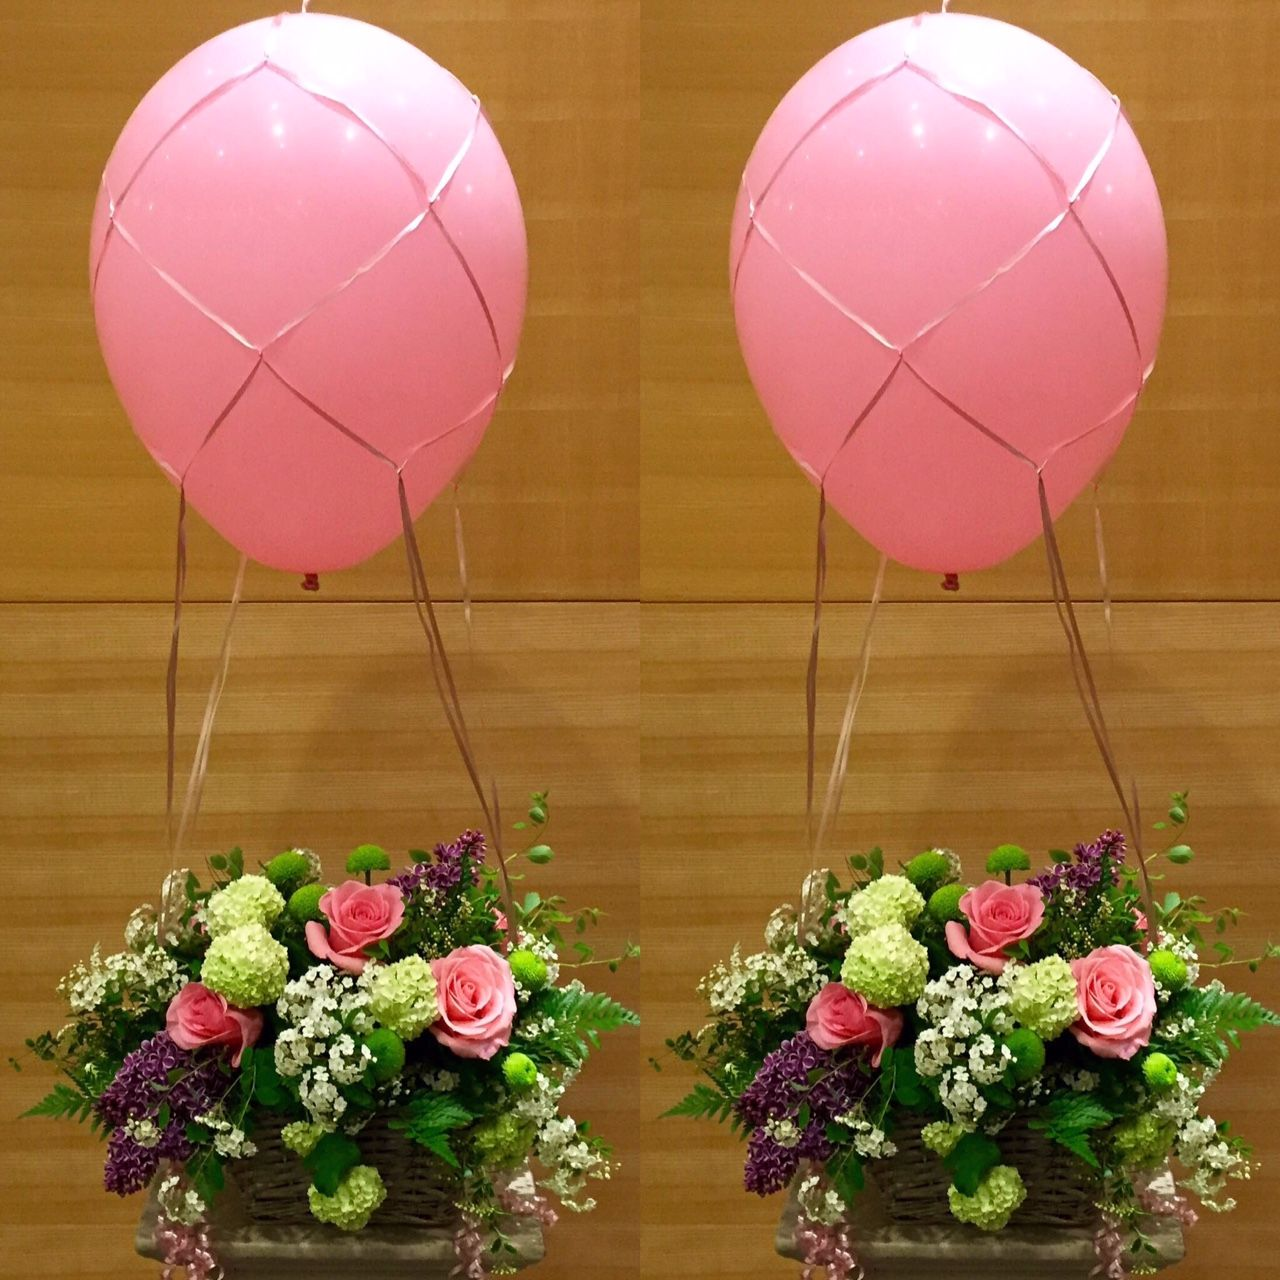 Hot Air Ballon Atop An English Garden Take Me Away Roses Speria Lilacs Hydrangeas Ferns Baby S Breath Mini Mums And More Floristika Vozdushnye Shary